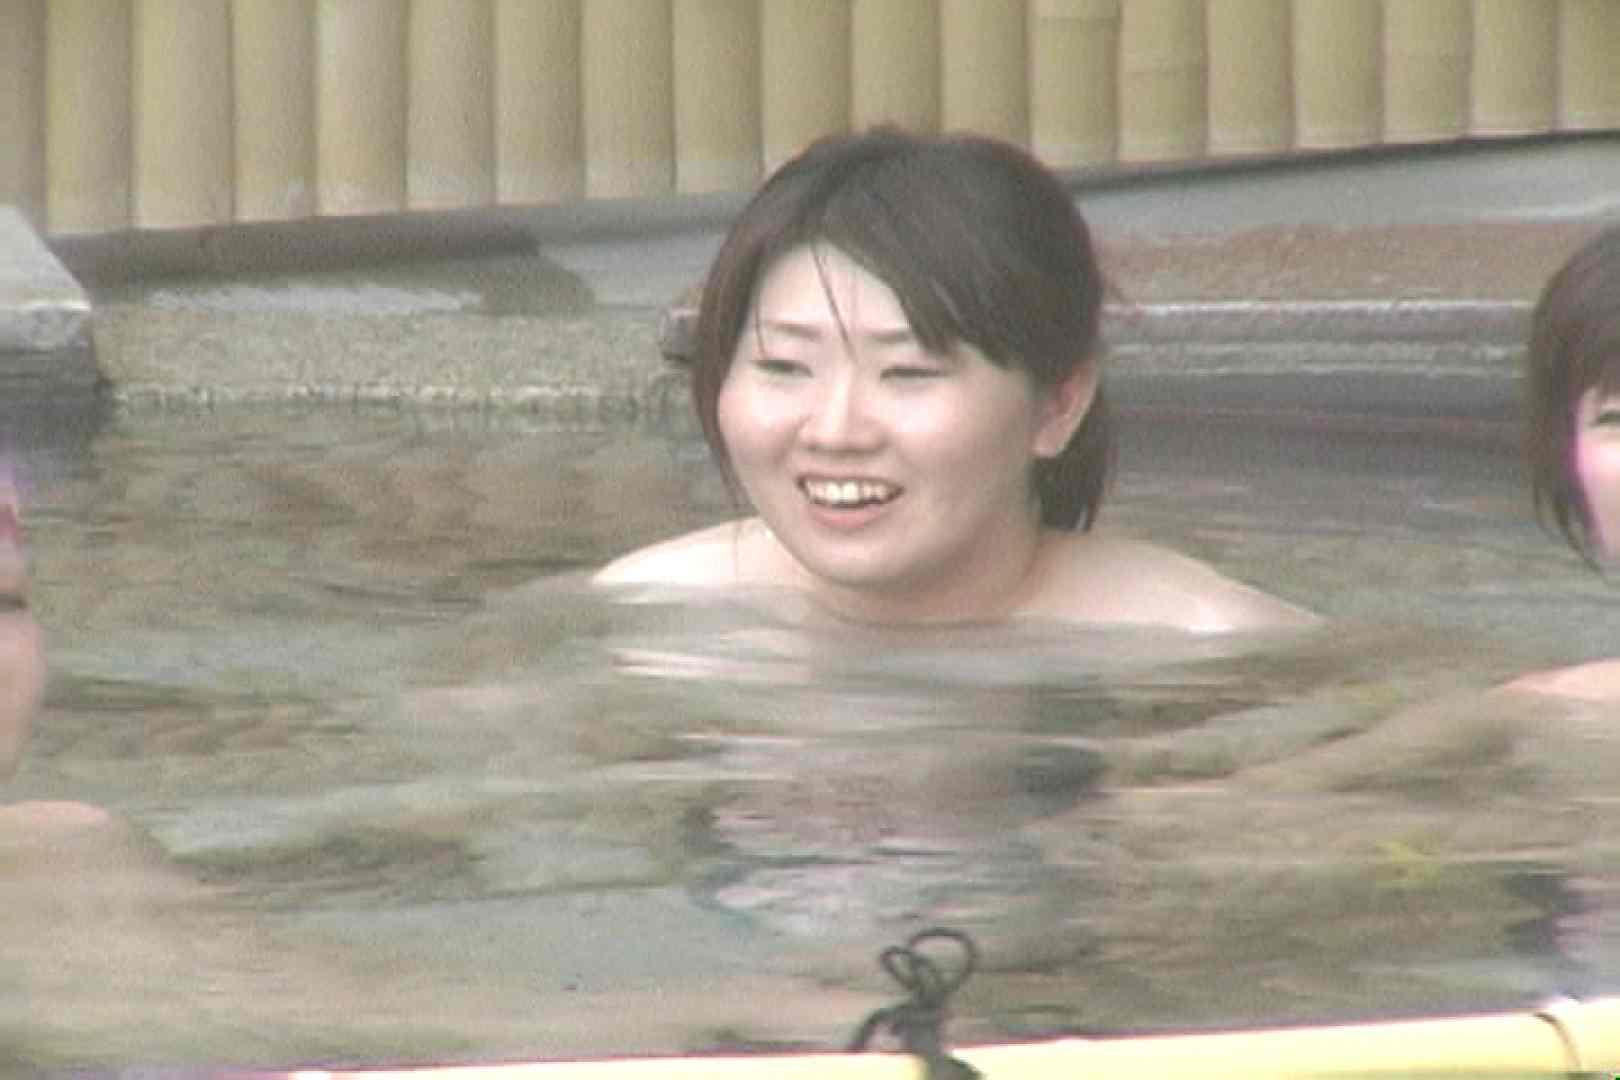 Aquaな露天風呂Vol.25 0 | 0  47連発 47